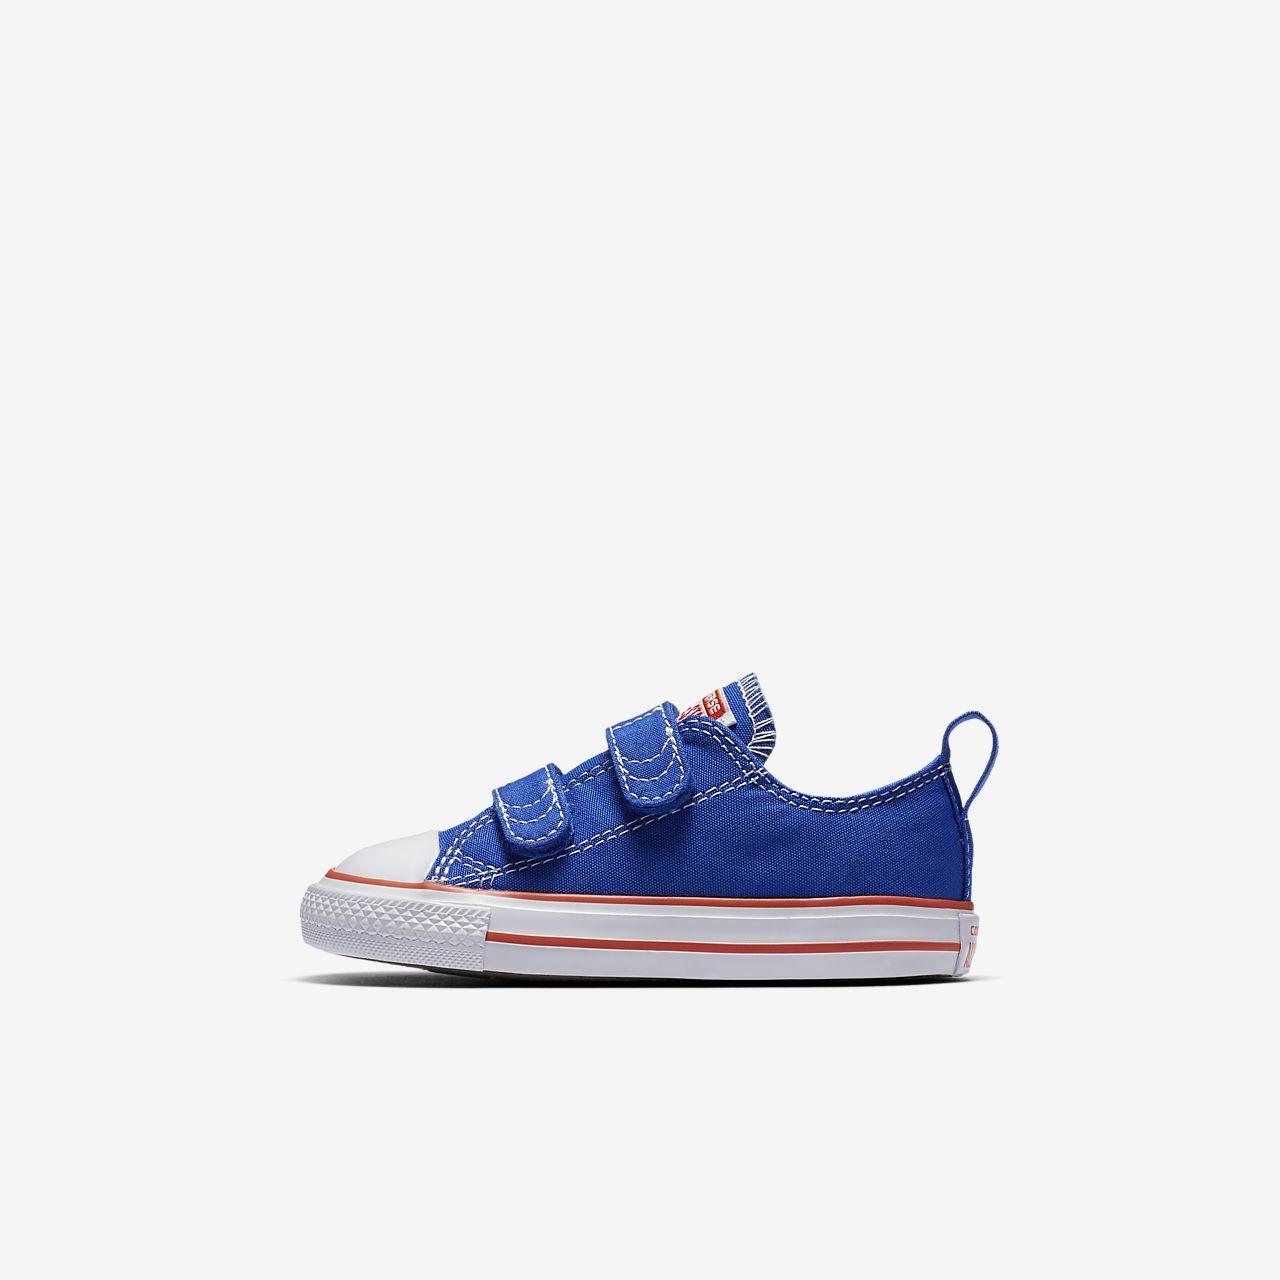 Converse Chuck Taylor All Star 2V Seasonal Low Top Infants' Shoe